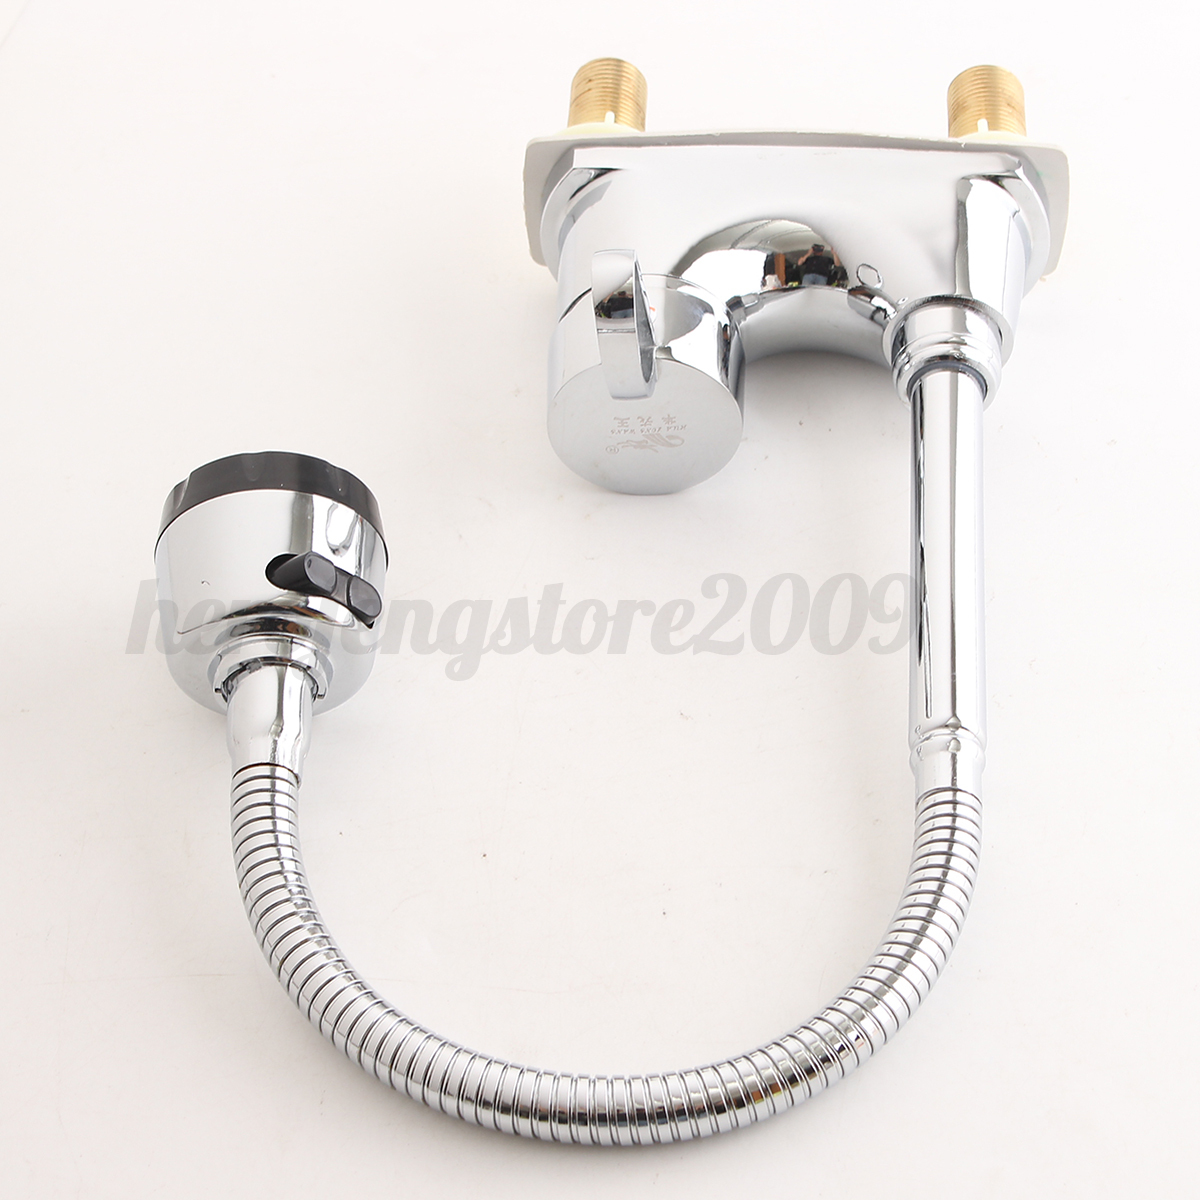 Flexible Spout Swivel Hose Mixer Tap Water Faucet Bathroom Basin Kitchen Sink Ebay